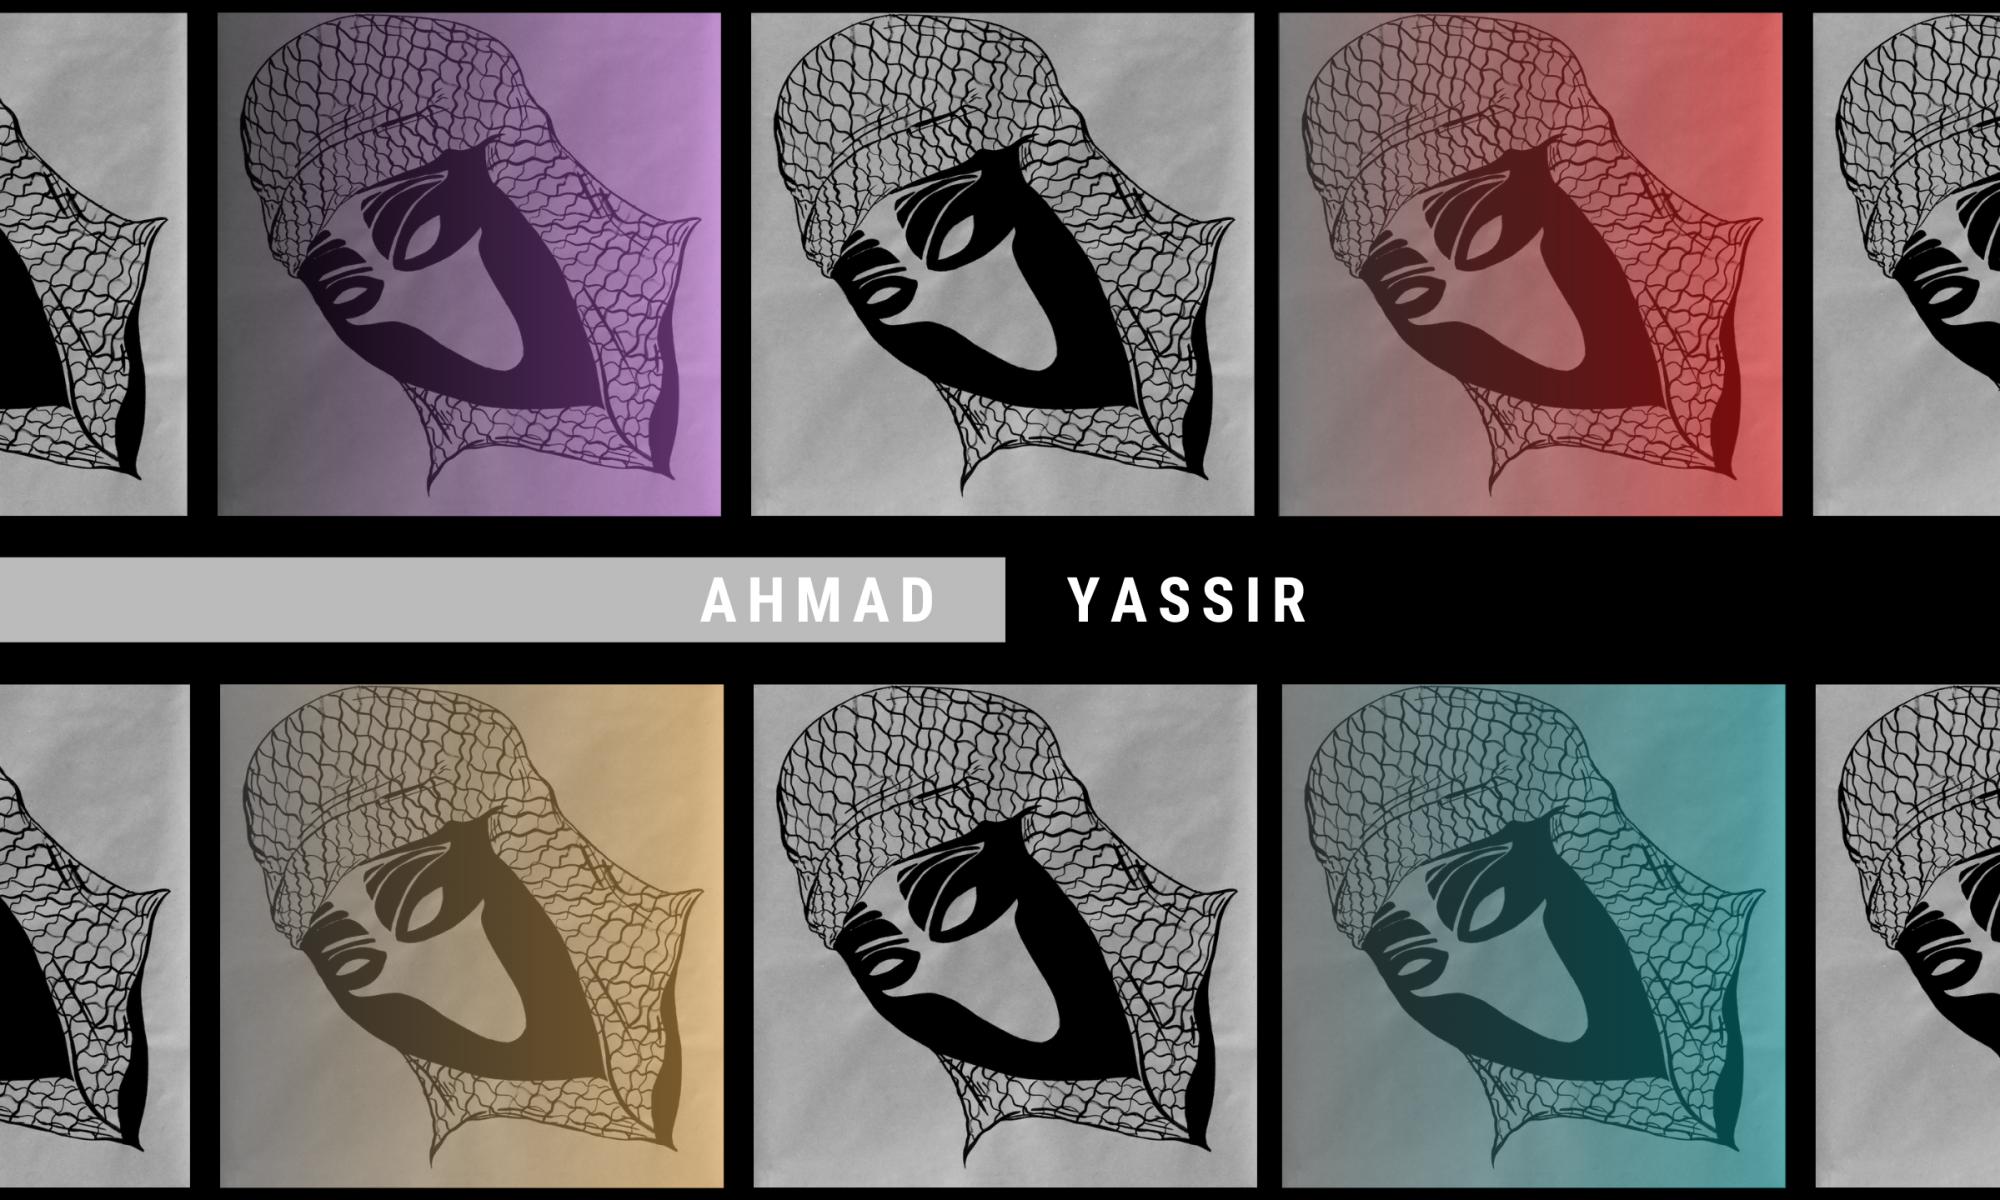 Ahmad Yassir